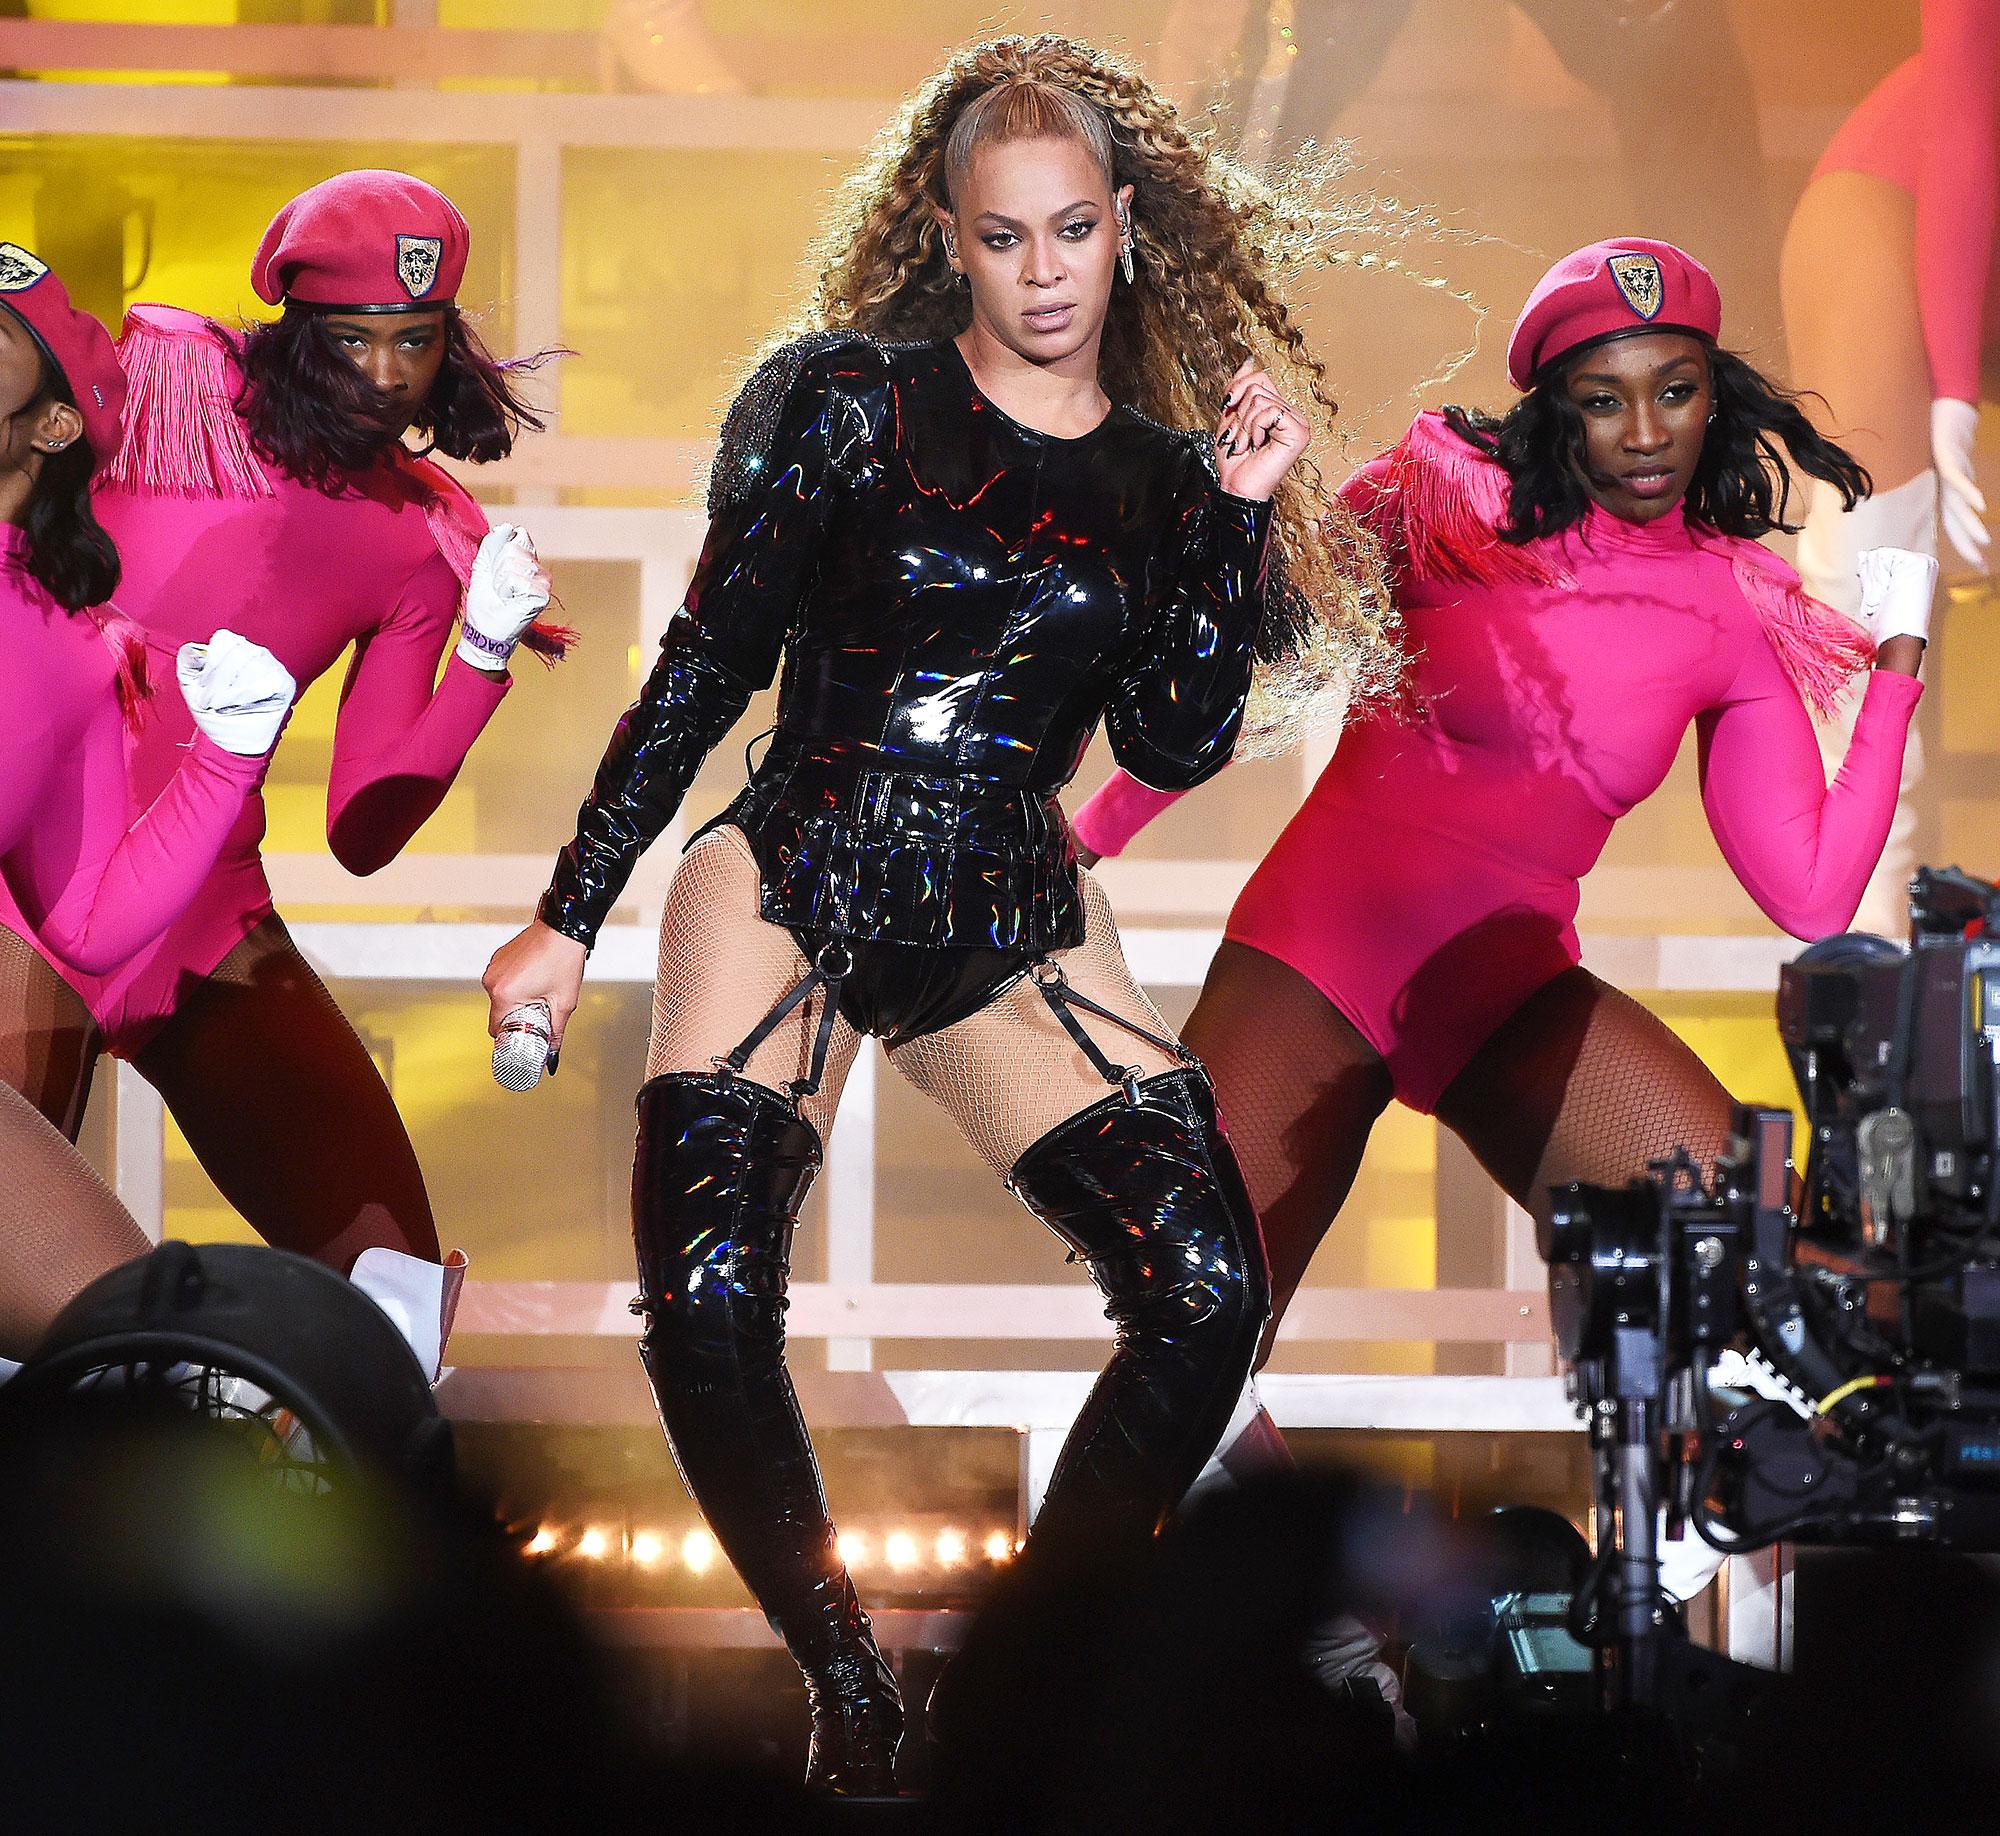 Beyonce Makeup Artist Sir John Highlighter Easy Glam Look Coachella 2018 Homecoming